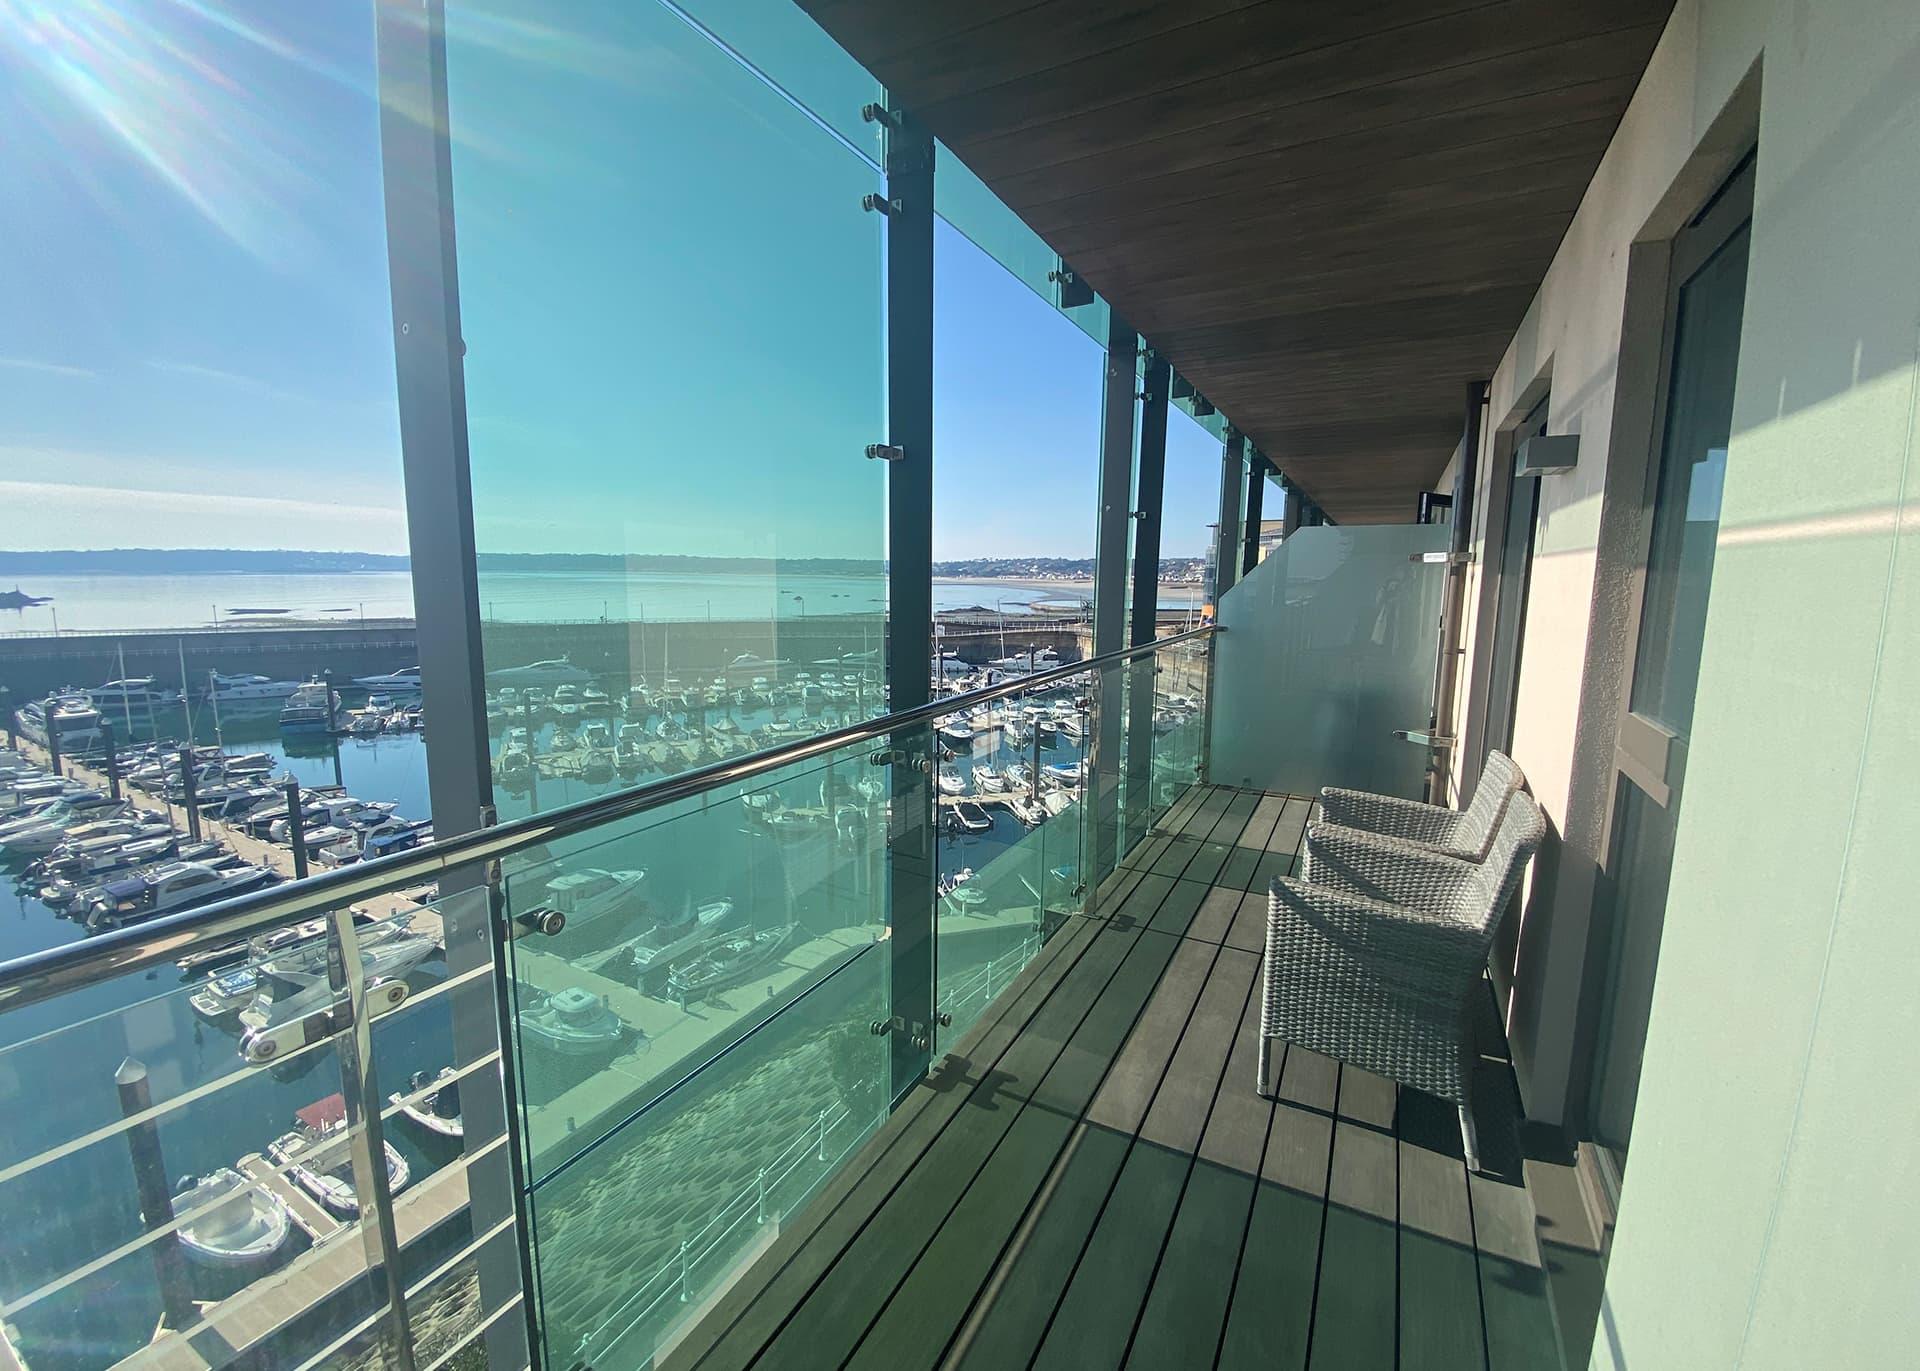 Apartment B235 balcony space